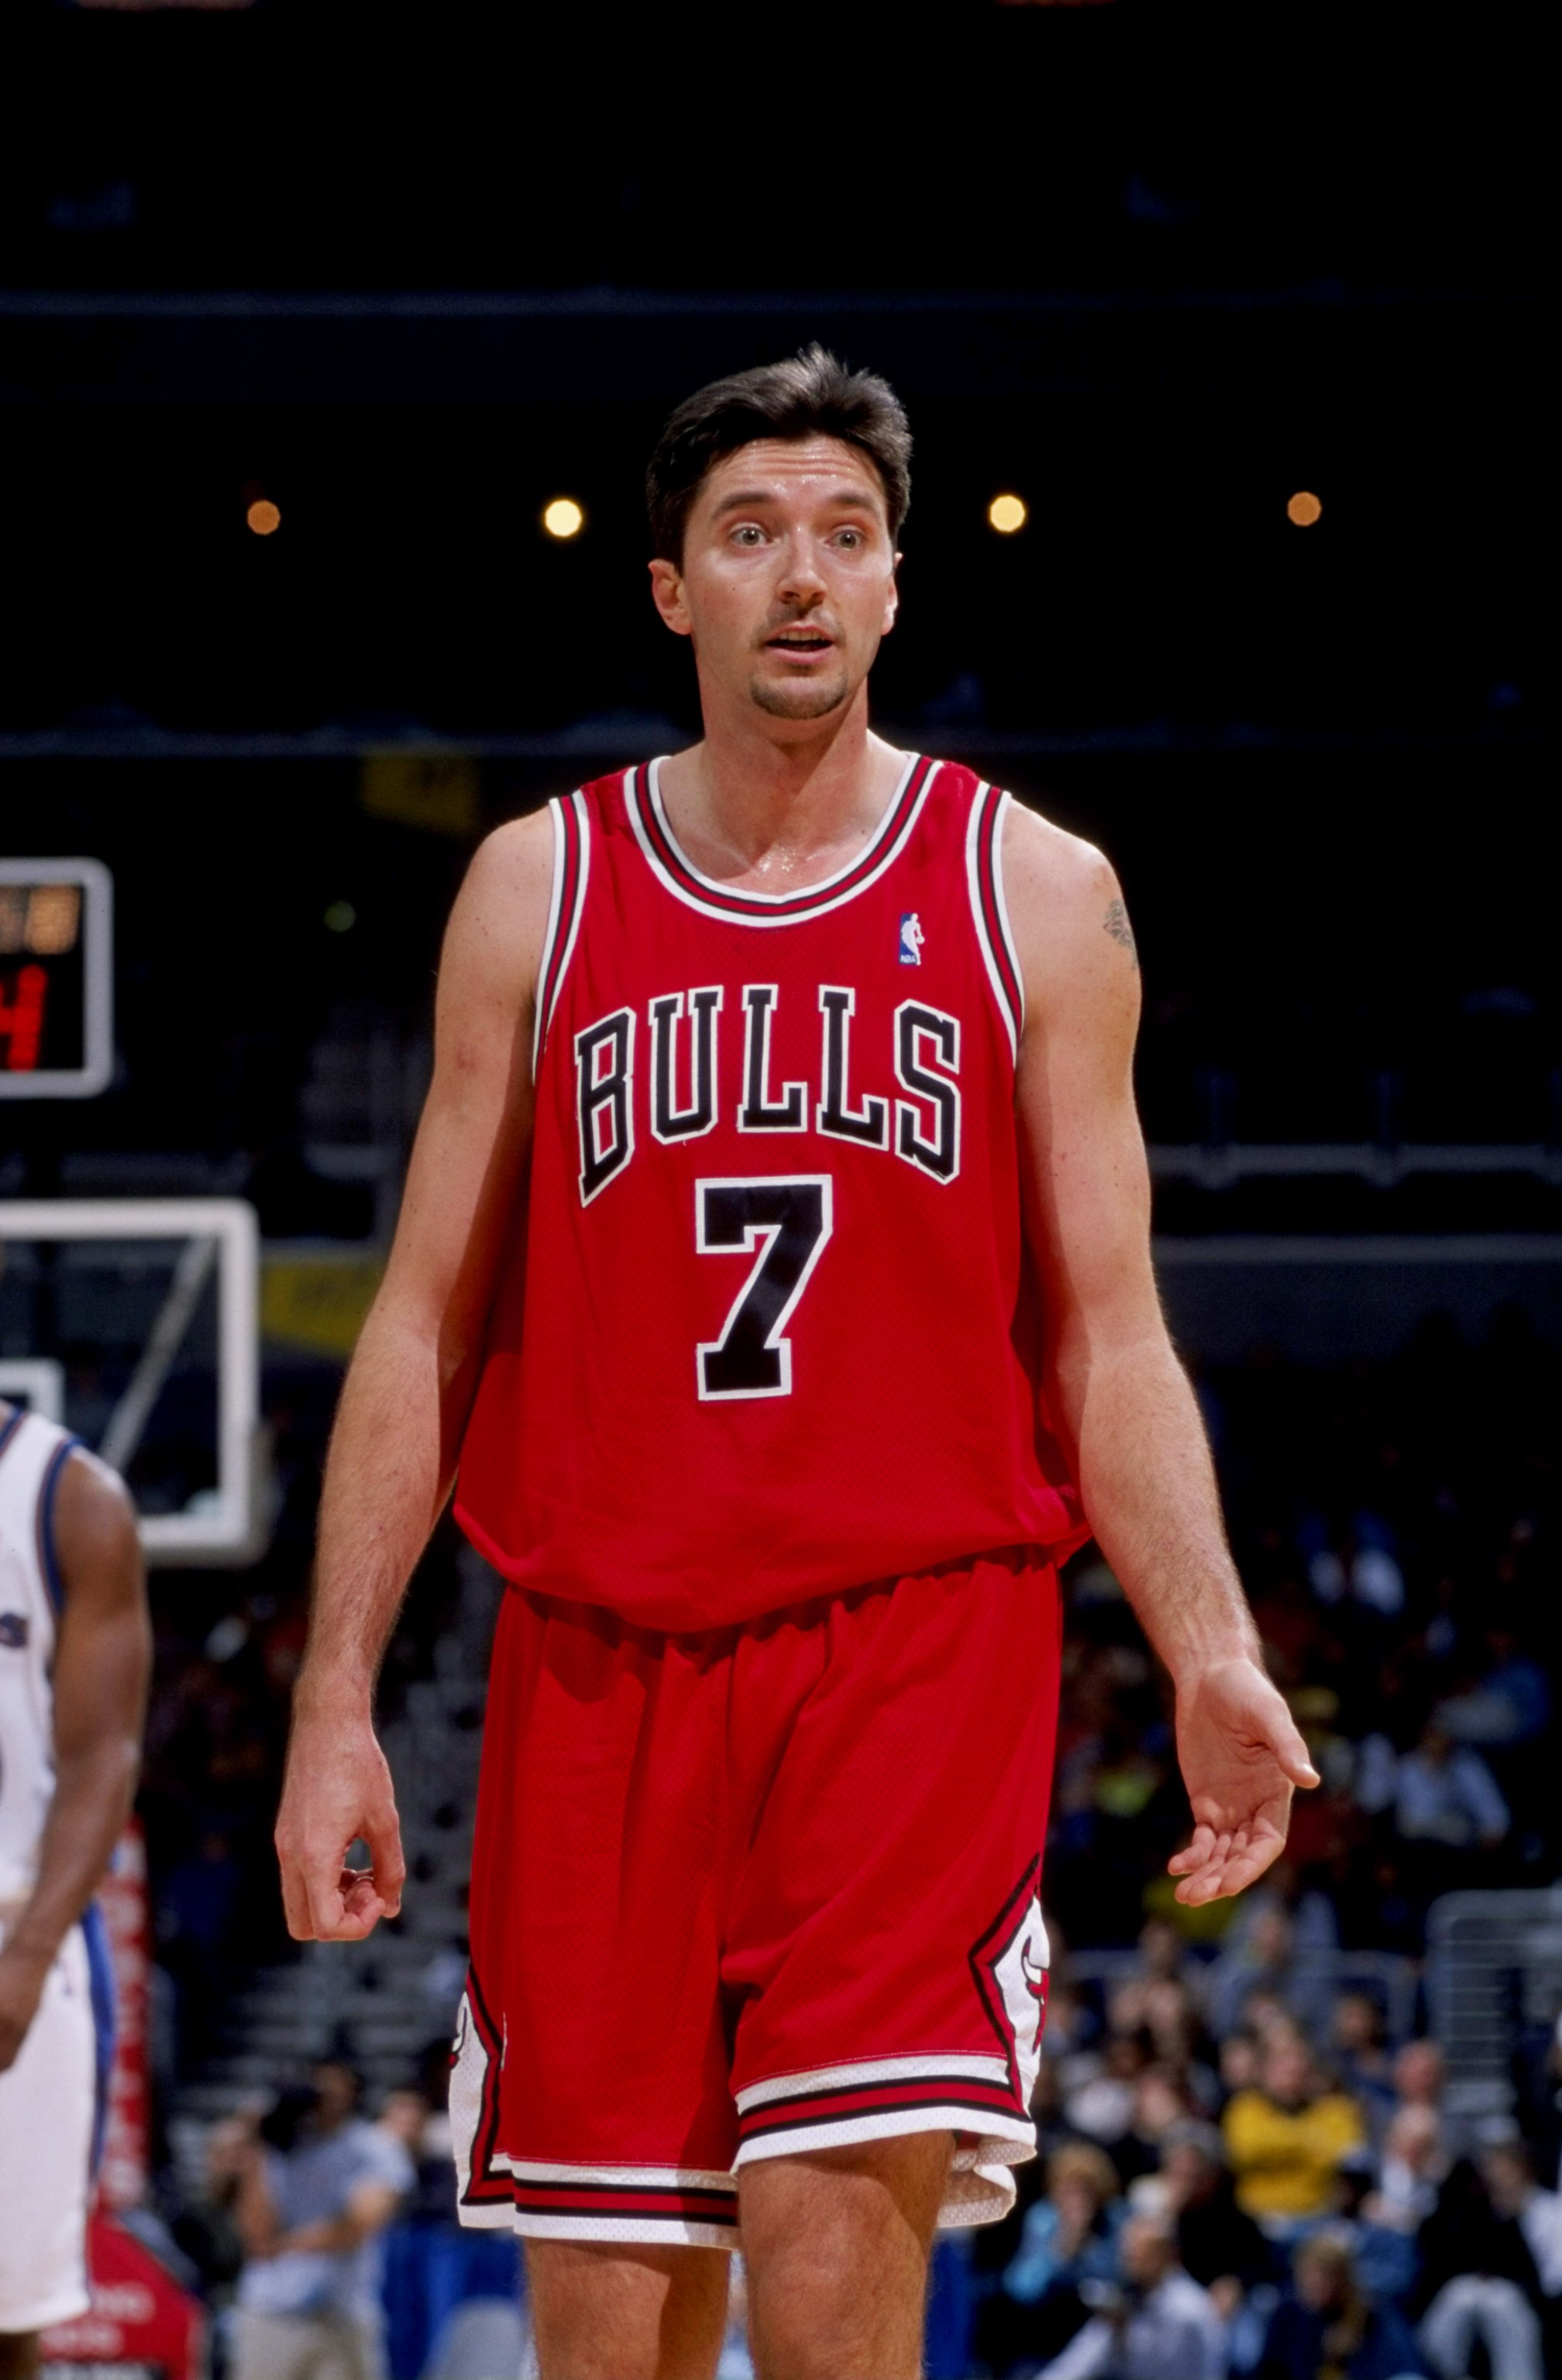 19 Feb 1999:  Toni Kukoc #7 of the Chicago Bulls looking on during the game against the Washington Wizards at the MCI Center in Washington, D.C. The Wizards defeated the Bull 93-91.  Mandatory Credit: Doug Pensinger  /Allsport